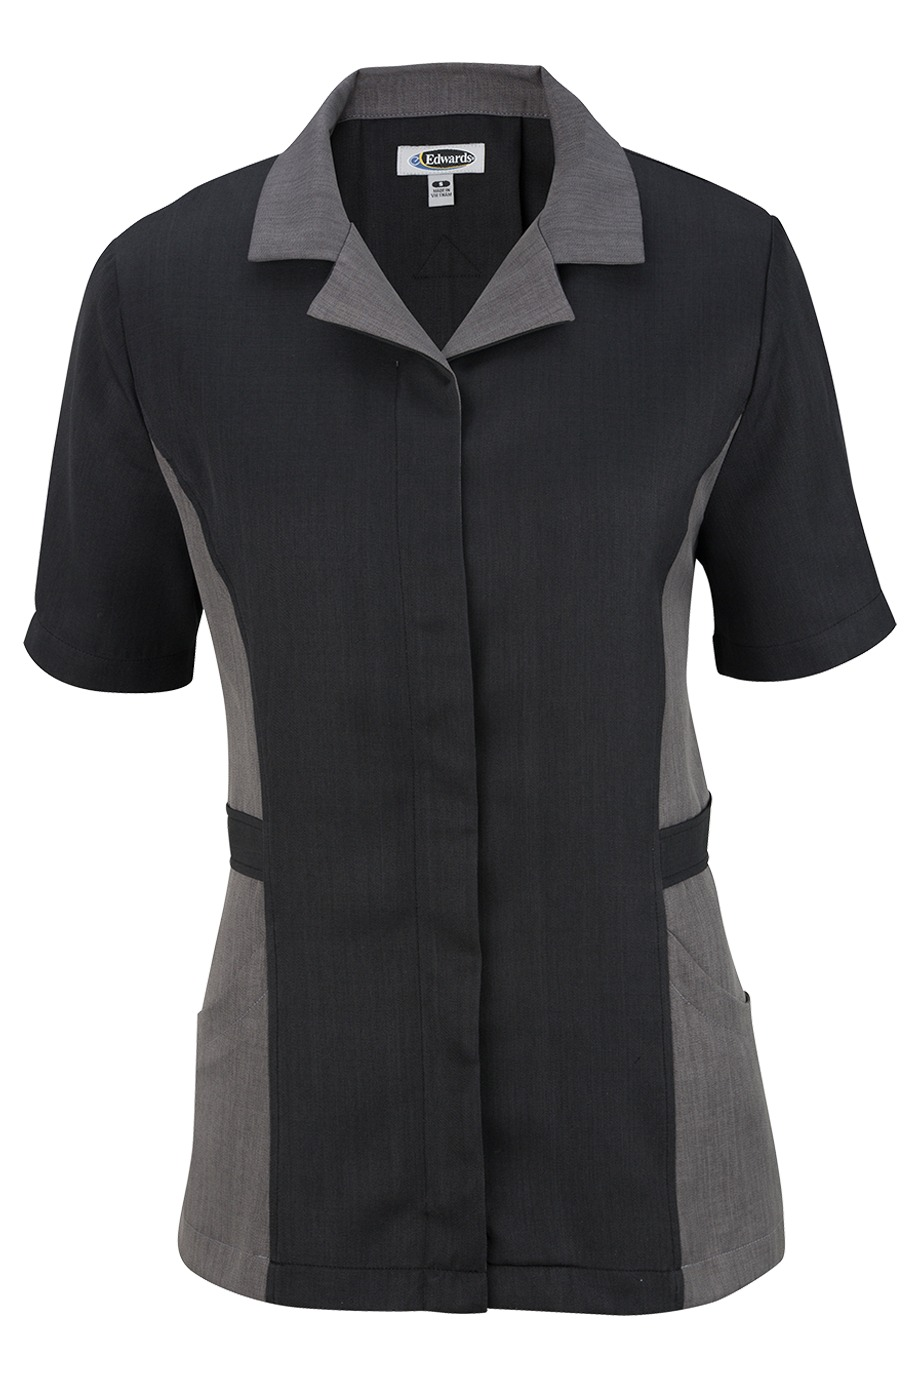 Edwards Garment 7890 - Premier Ladies Tunic